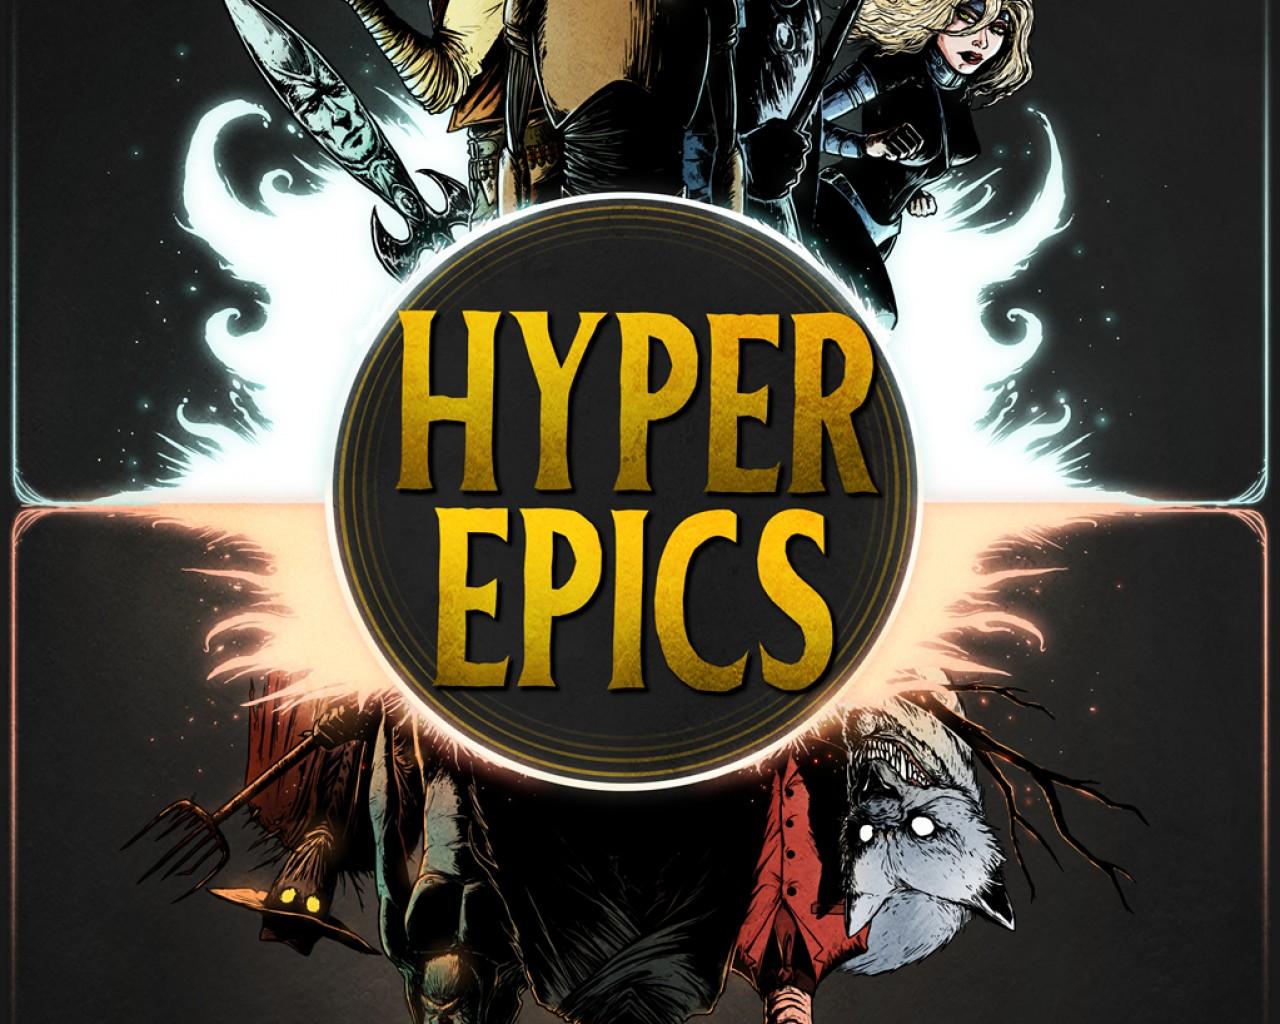 Poster Image for Hyper Epics